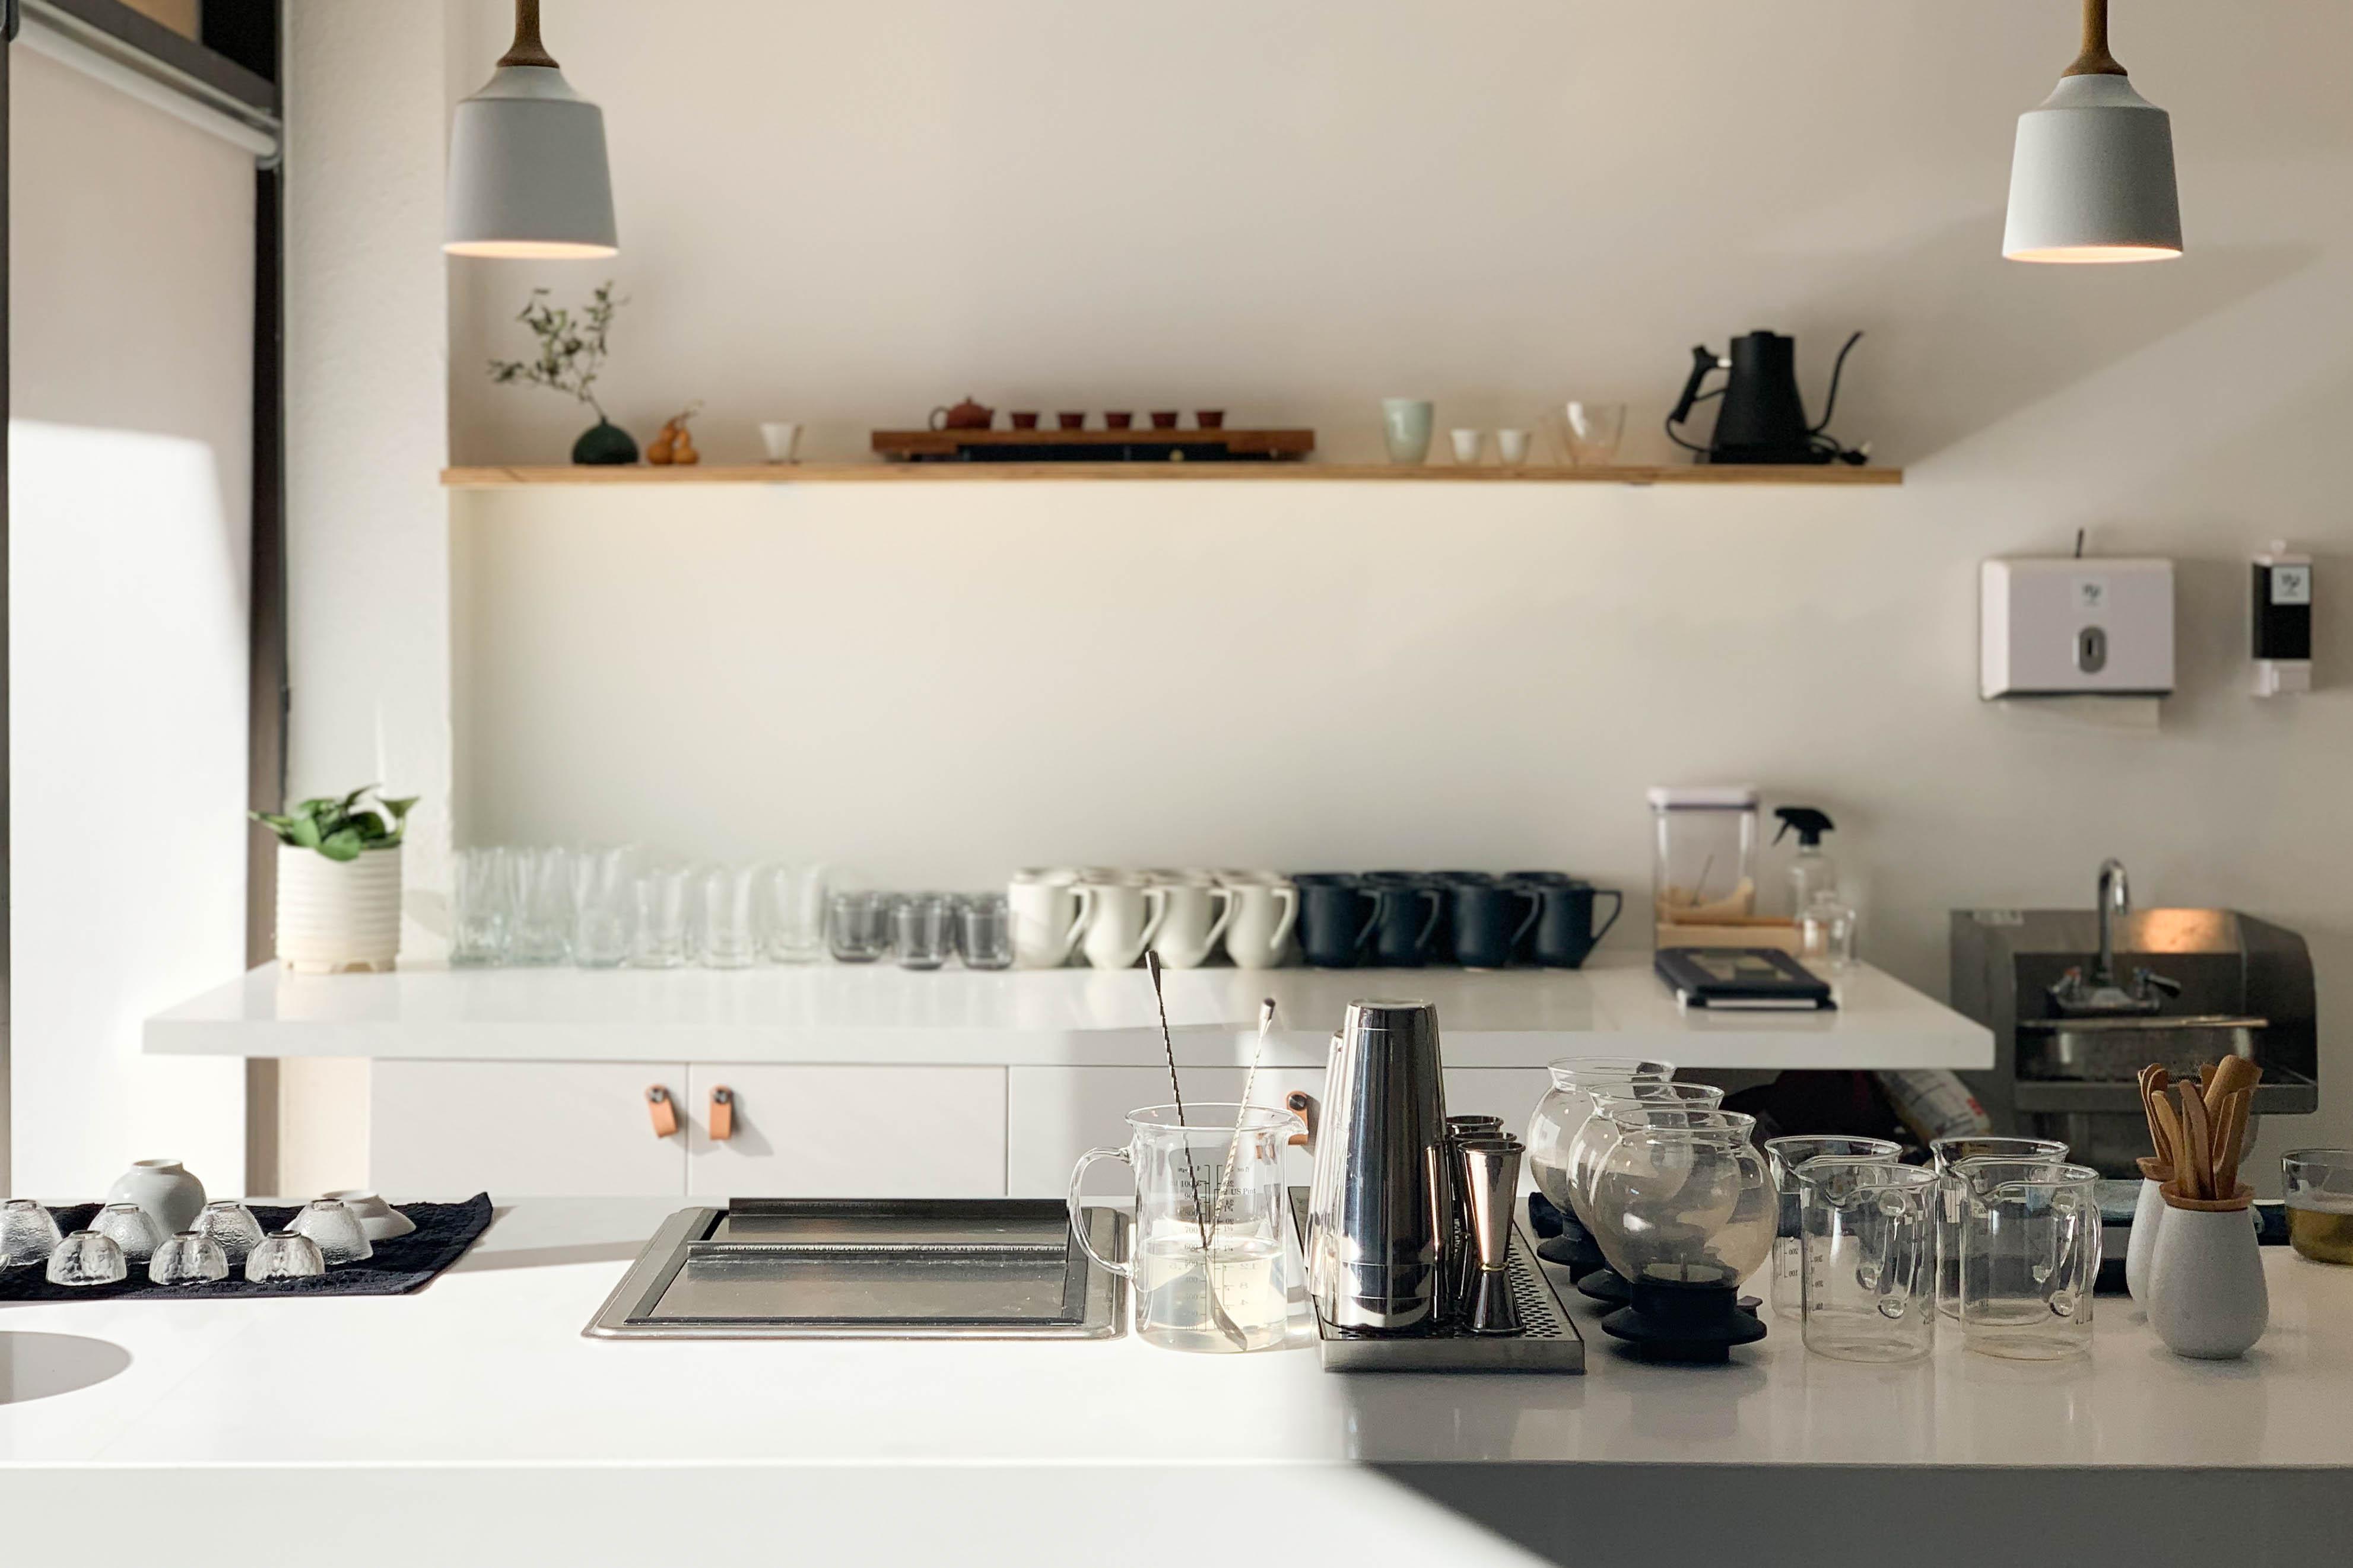 A sleek, modern tea bar, set up for service as the sun streams in.